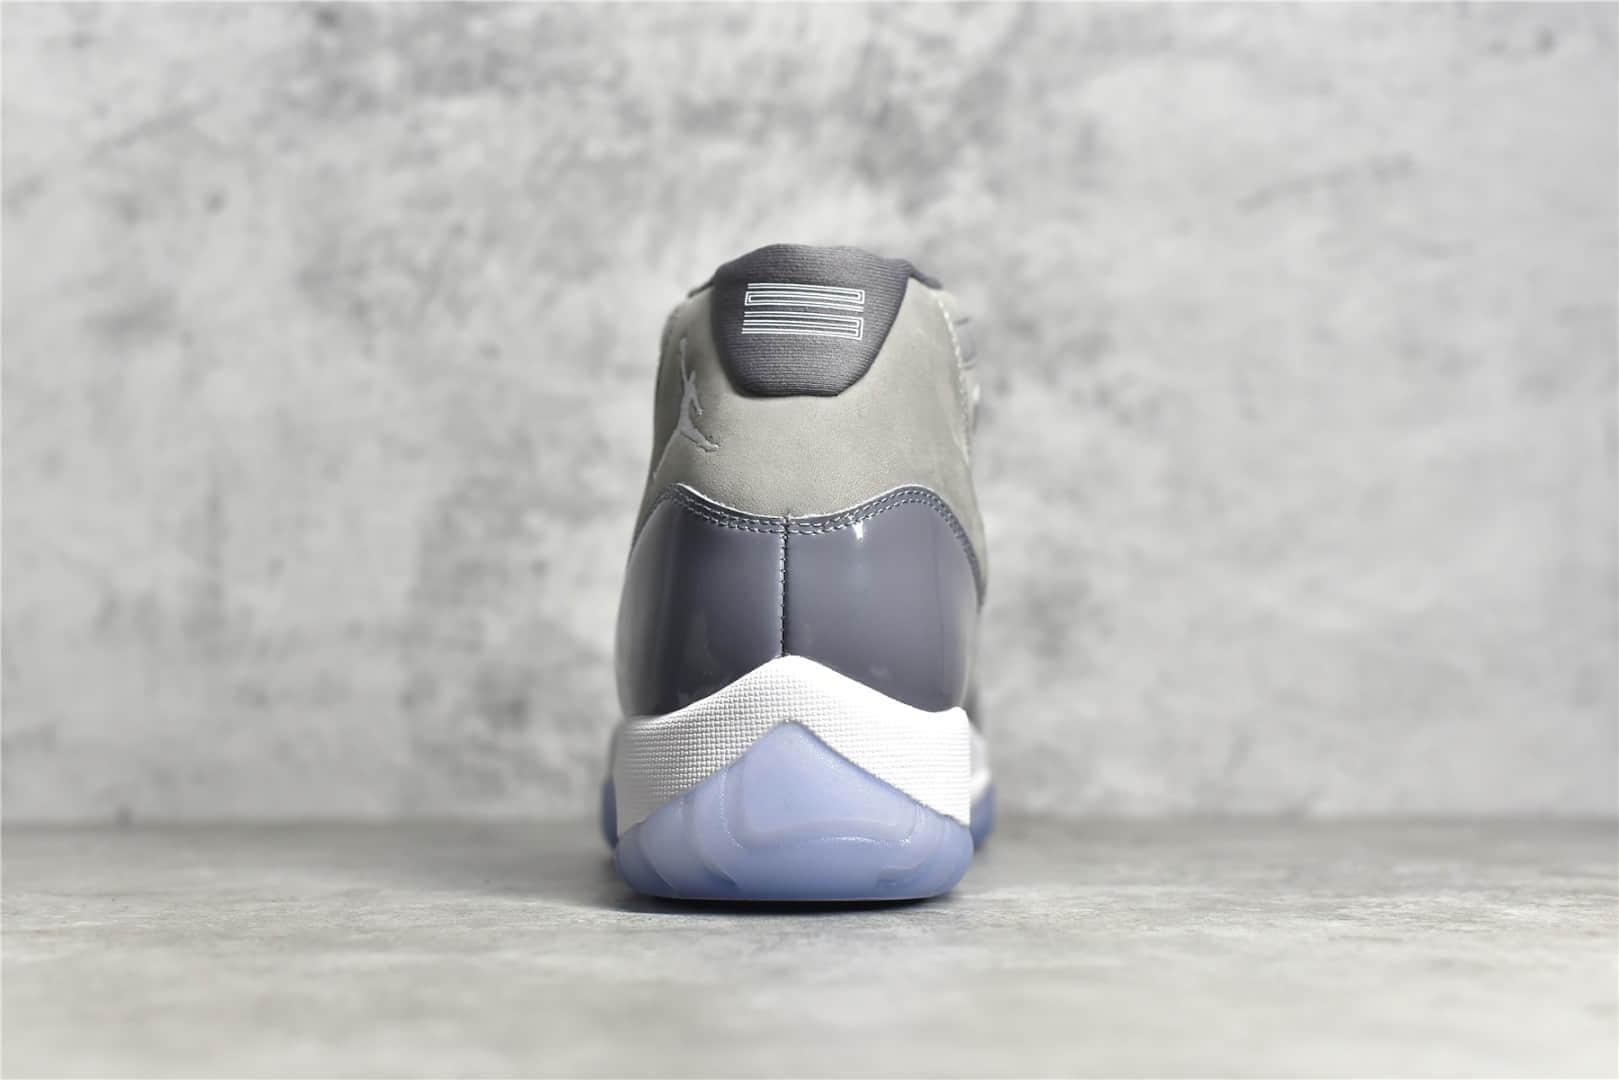 "AJ11酷灰高帮实战篮球鞋 Air Jordan 11 ""Cool Grey"" 真碳纤维AJ11灰色原厂进口材质LJR纯原版本 货号:CT8012-005-潮流者之家"